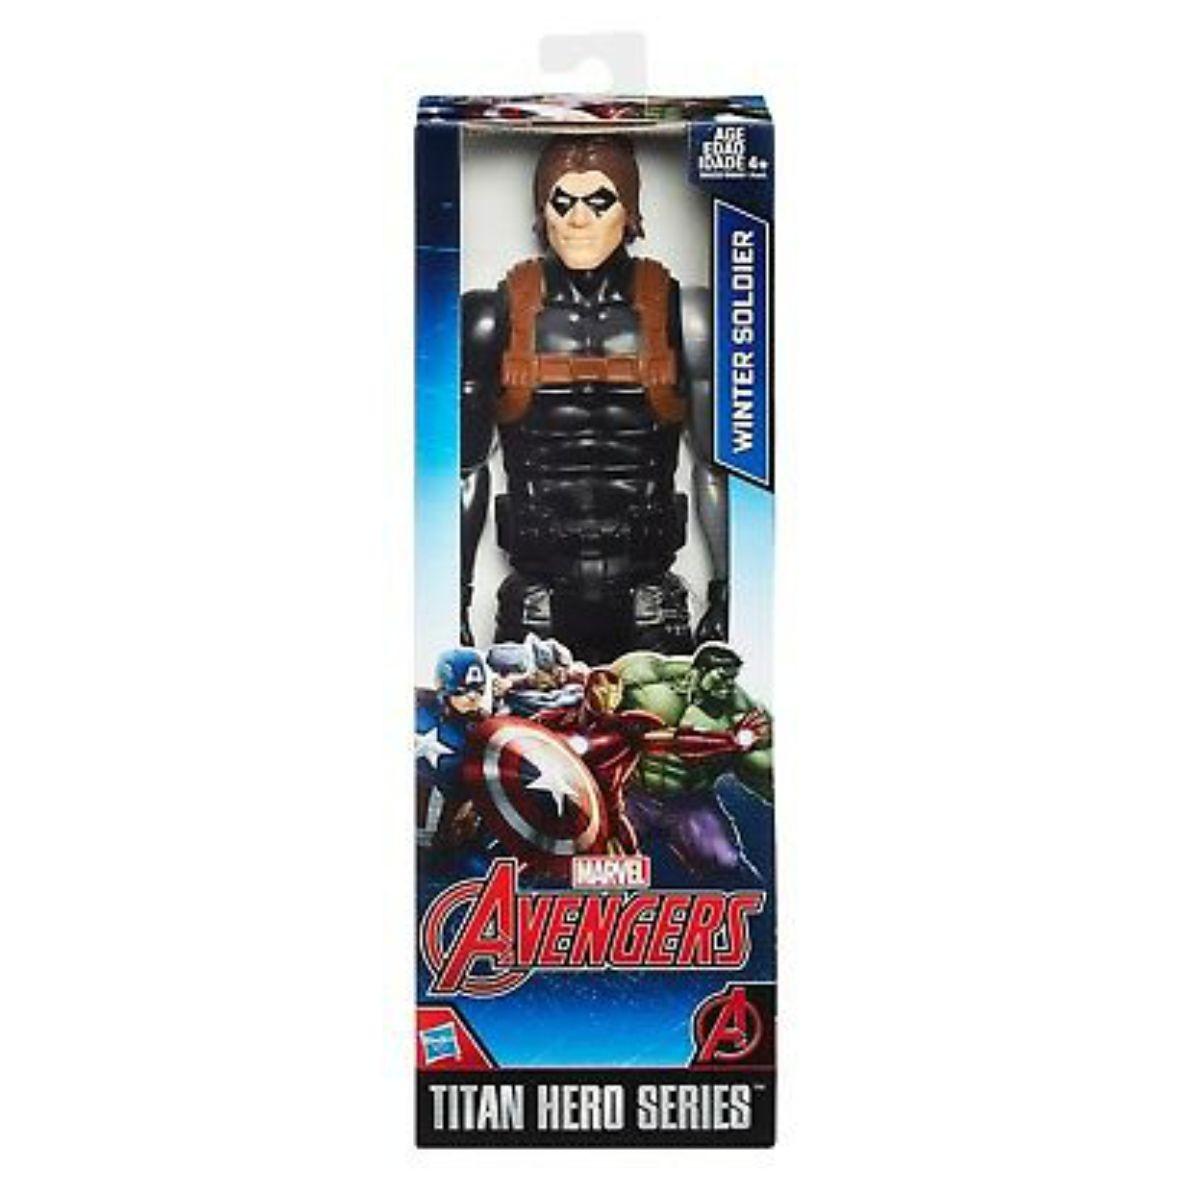 Boneco Articulado Titan Hero Series Winter Soldies 30c m - Hasbro